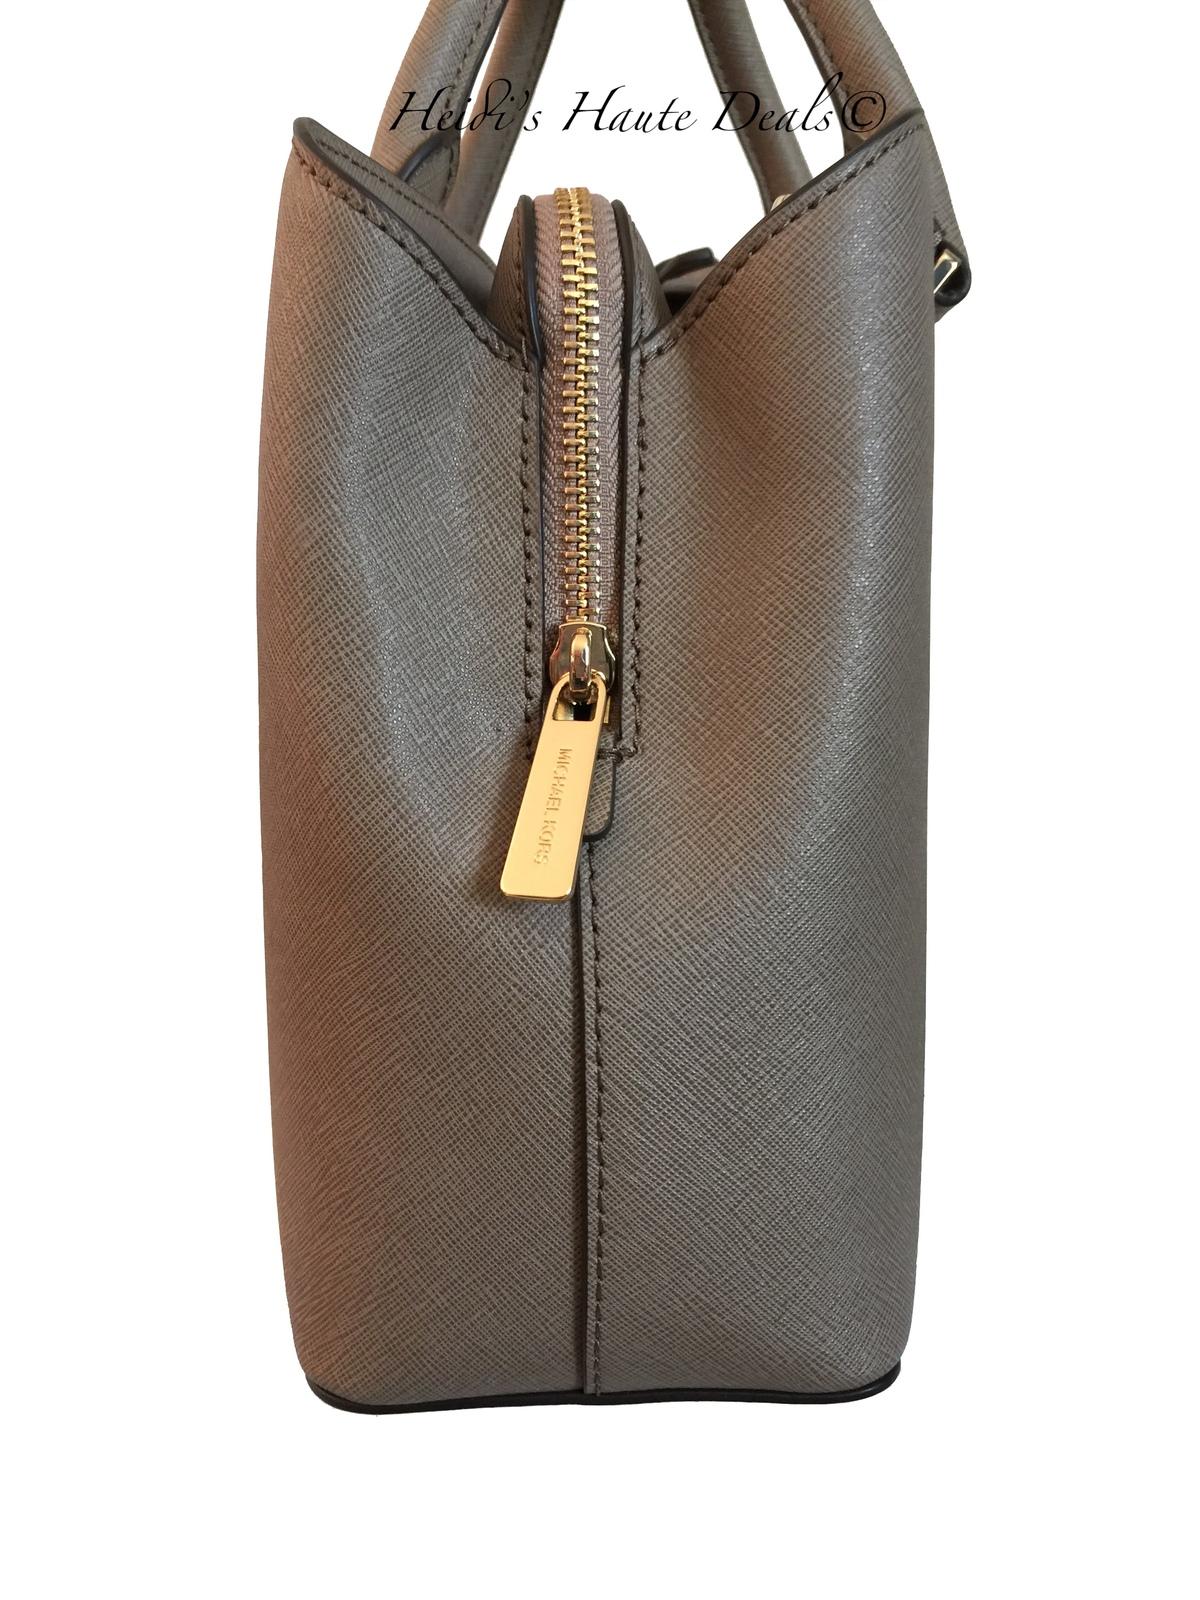 b75381997051 NWT MICHAEL KORS Savannah Medium Satchel Dark Dune Saffiano Leather Bag  Purse